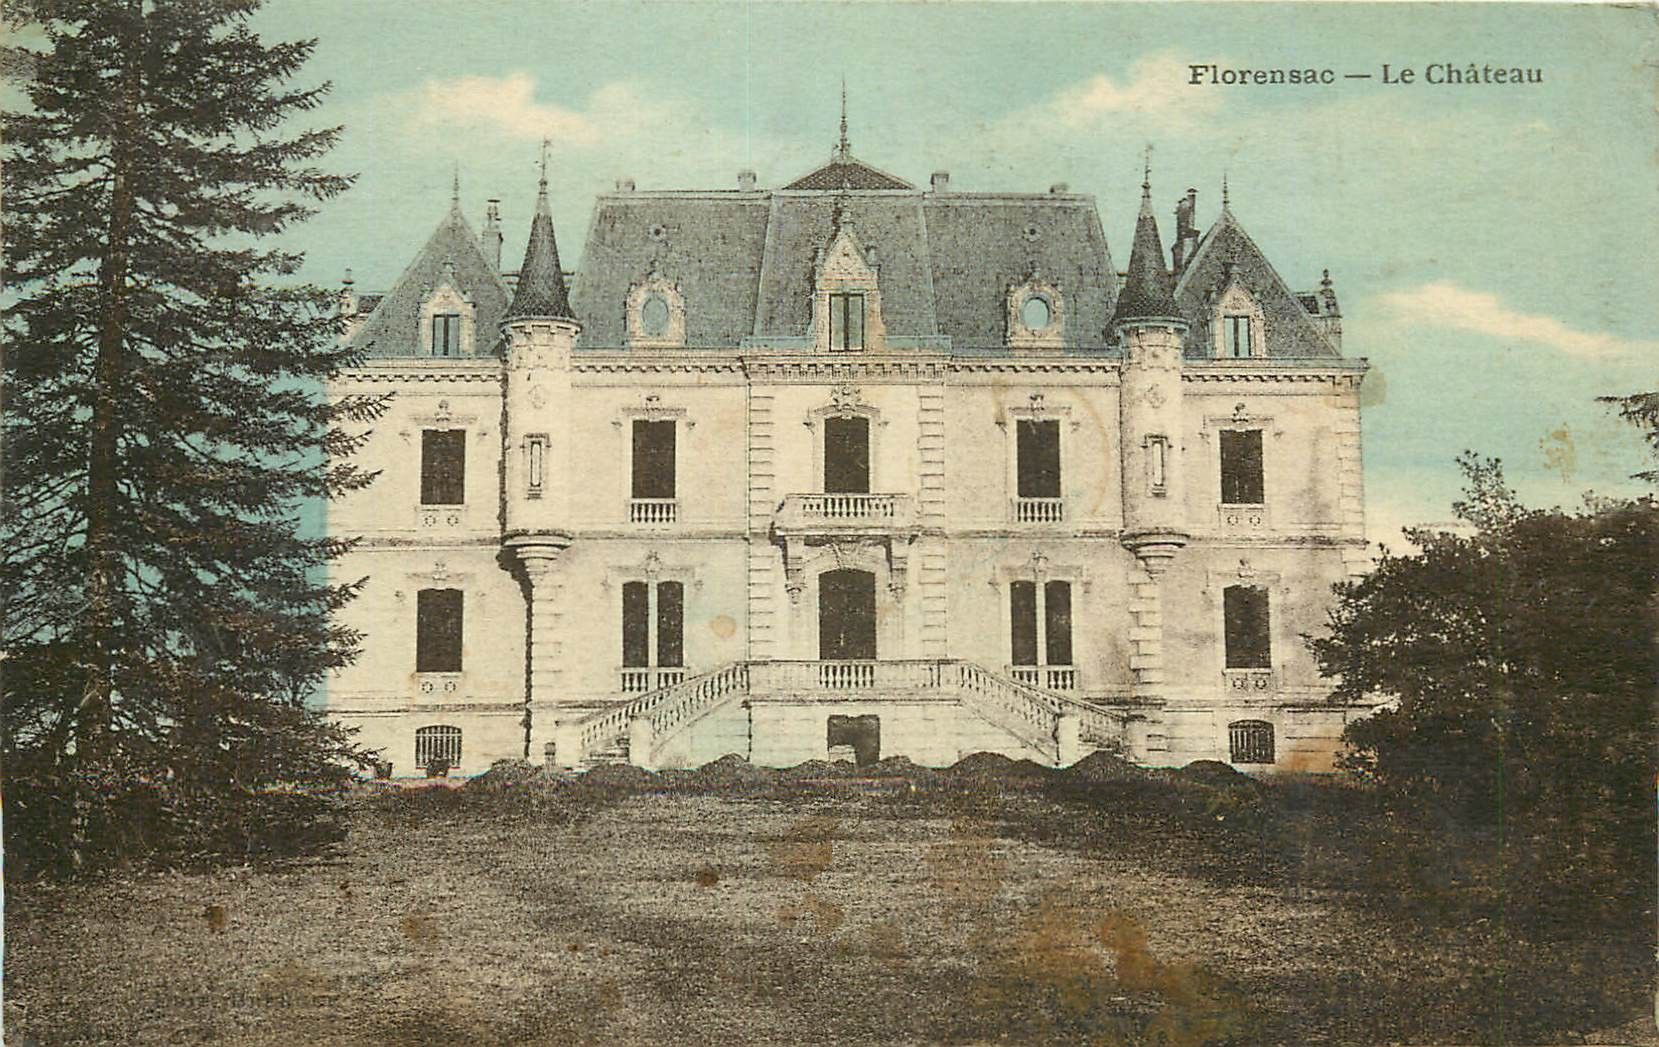 34 FLORENSAC. Le Château 1926